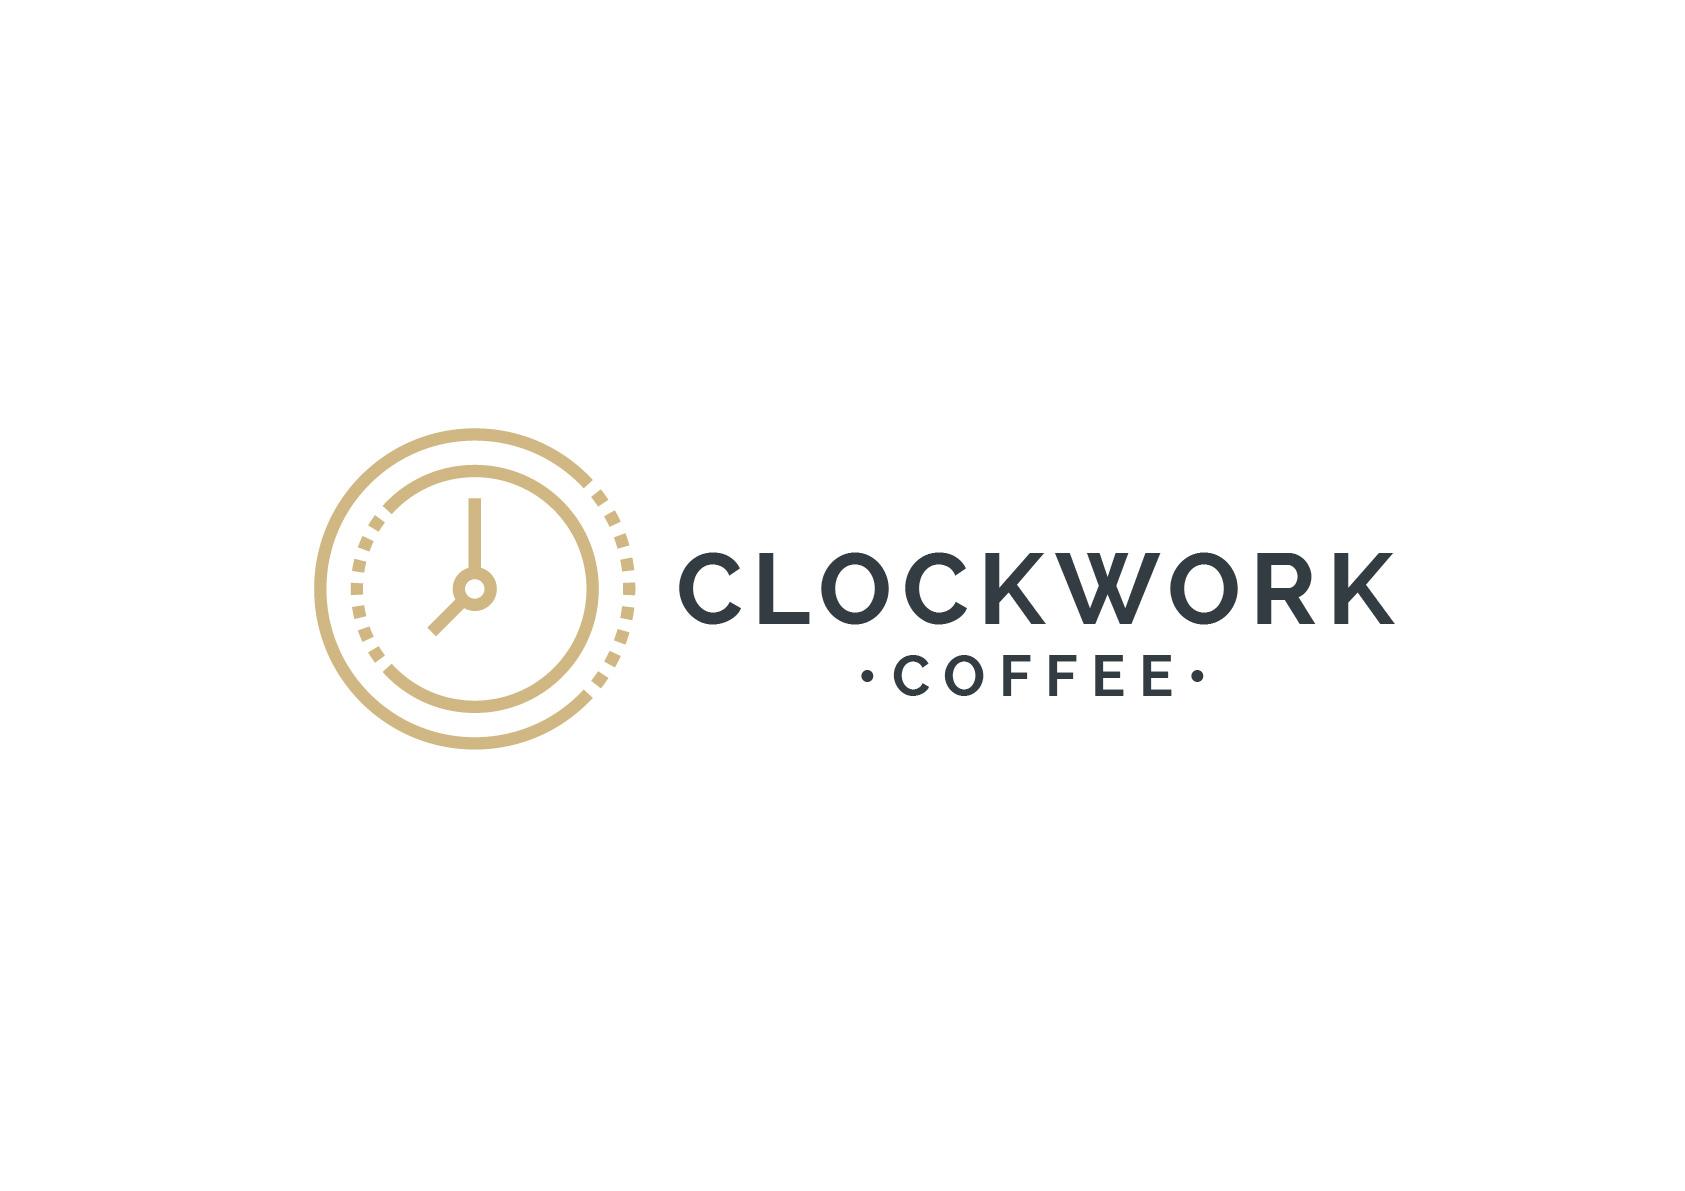 Clockwork Coffee  4.jpg